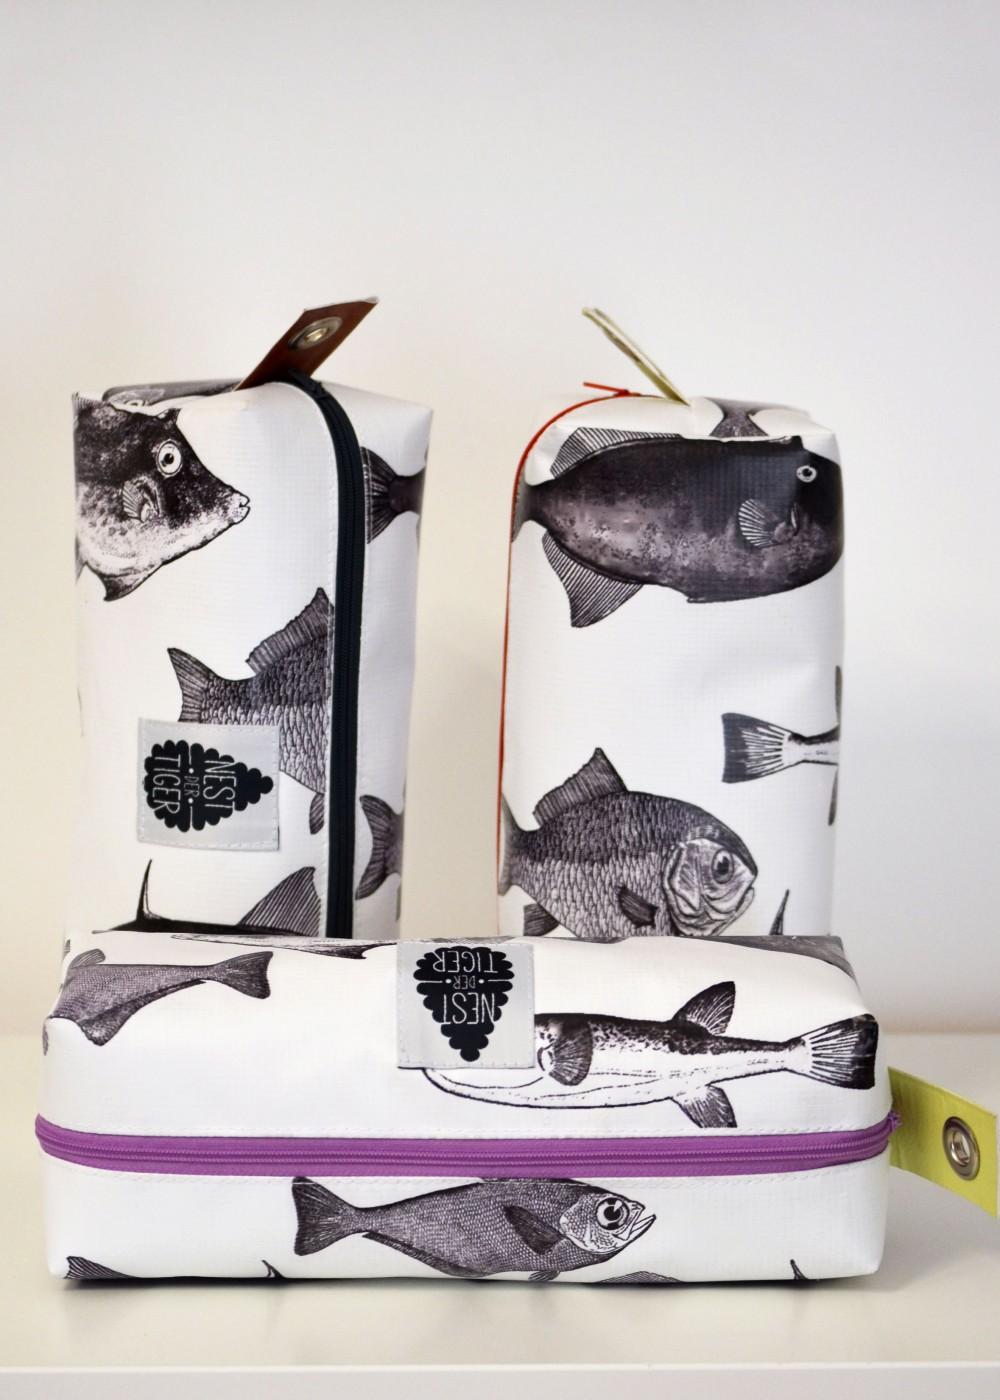 Zipptasche Fische